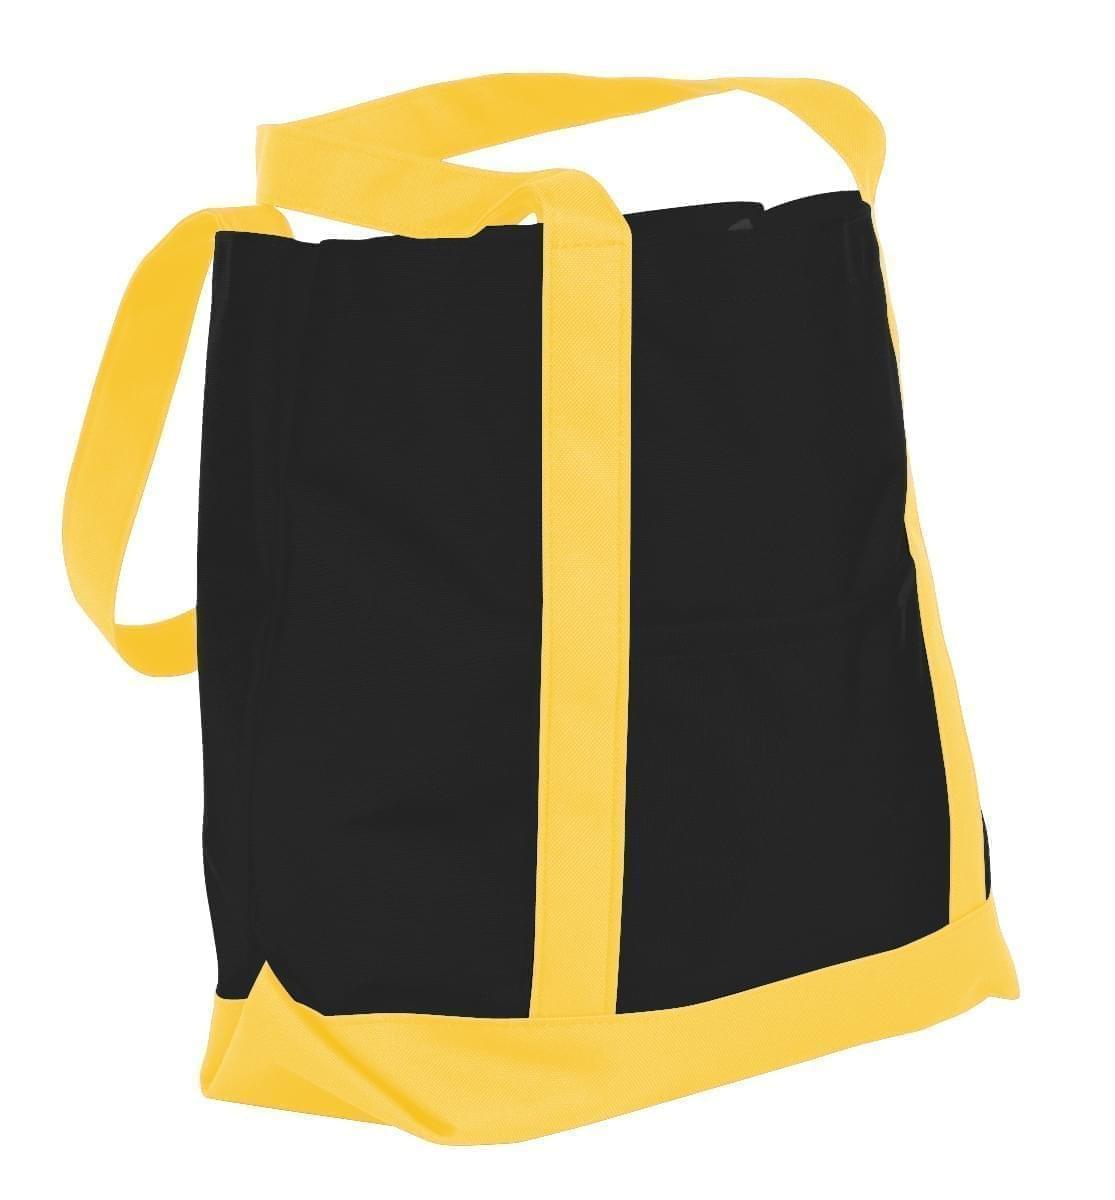 USA Made Nylon Poly Boat Tote Bags, Black-Gold, XAACL1UAOQ